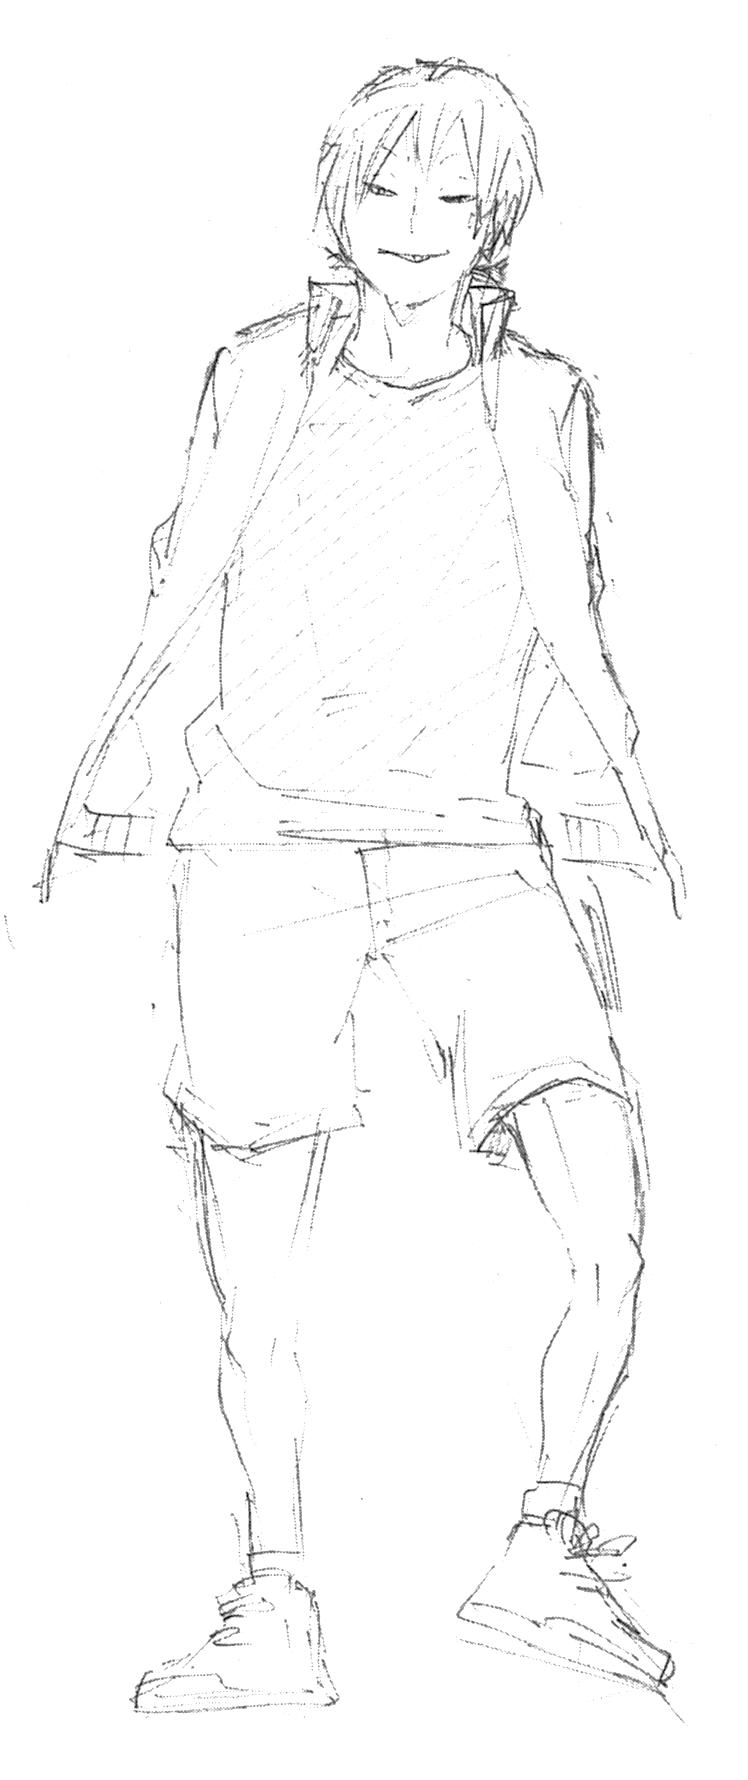 Akinori Konoha Sketch.png